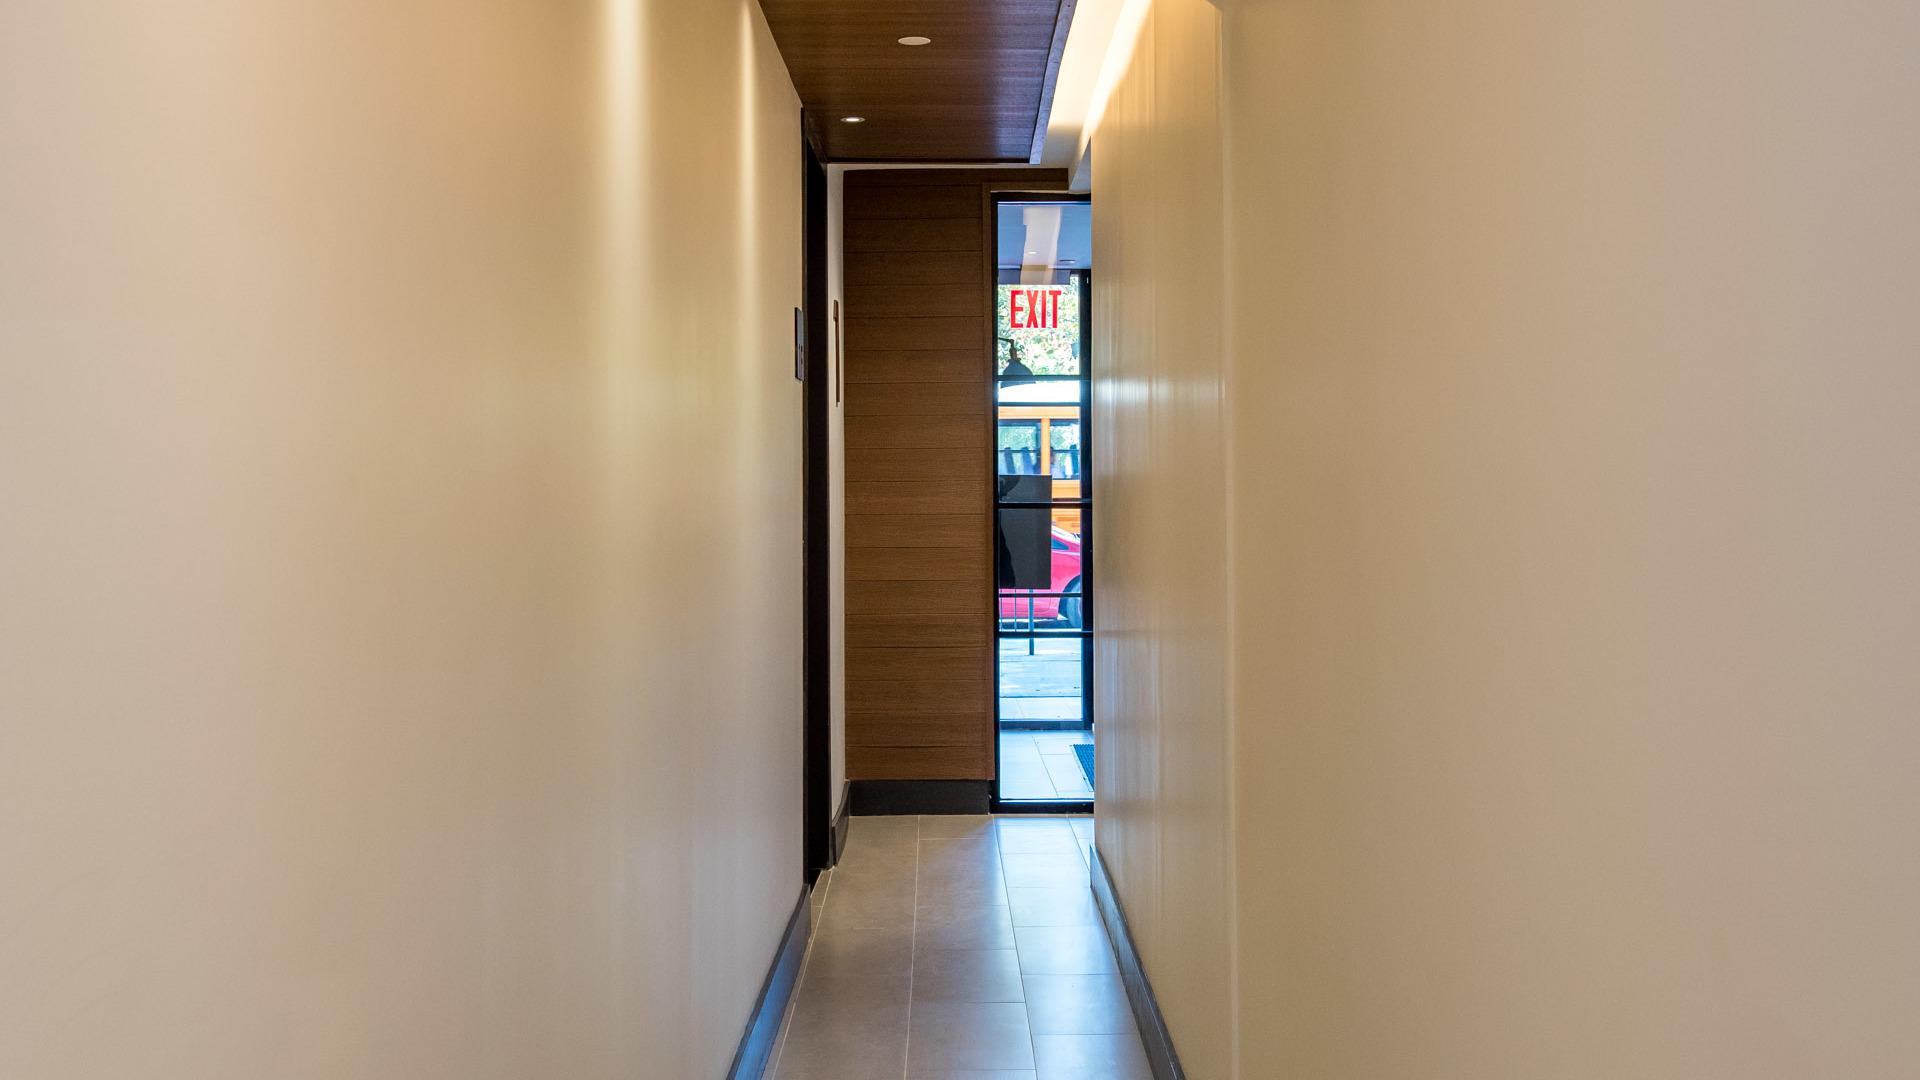 161 winthrop street interior first floor 5